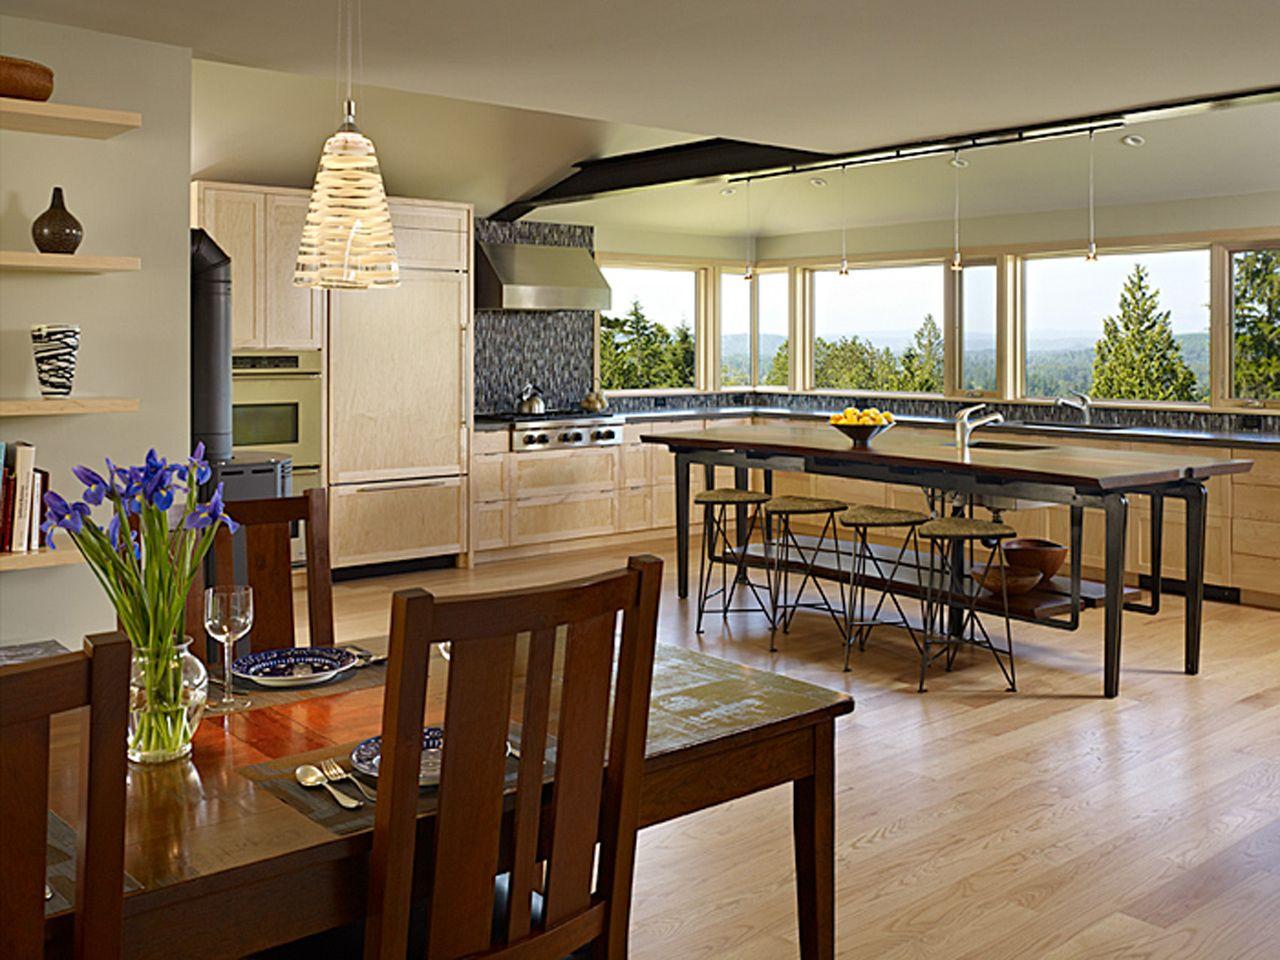 Küchenfenster ideen über spüle luxury and modern interior decor in fall city residence renovation